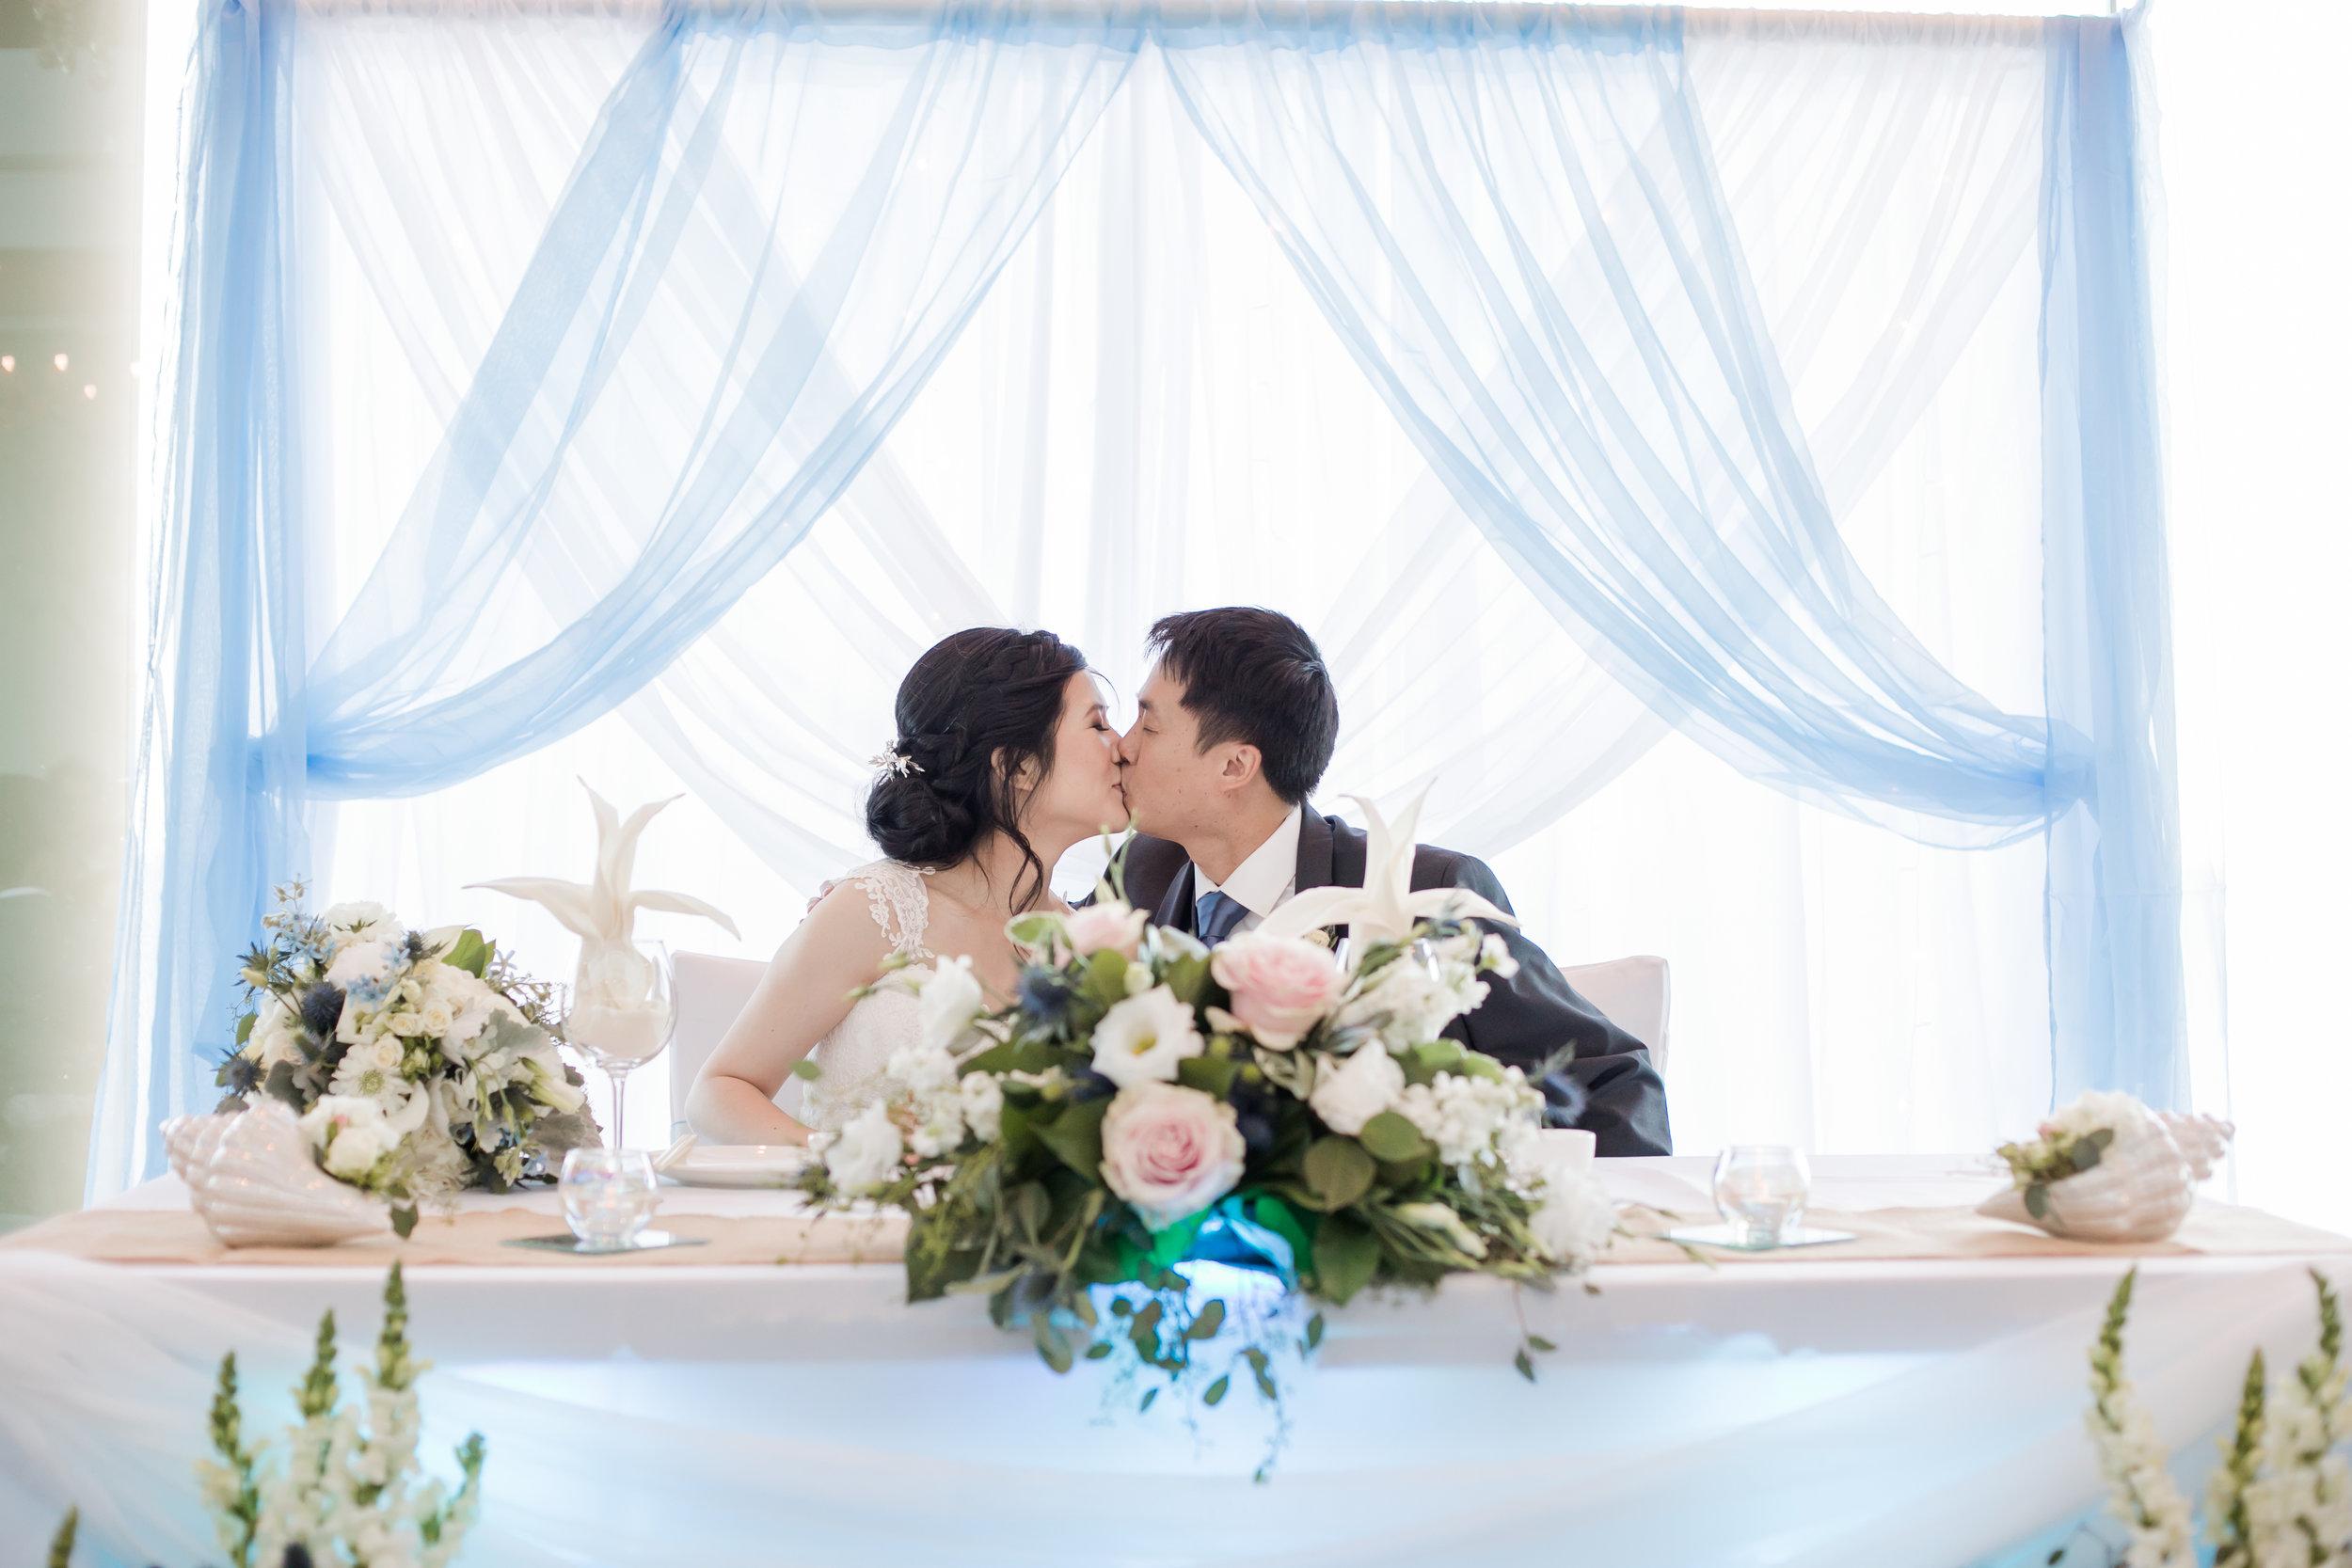 San Francisco Wedding - Michelle Chang Photography